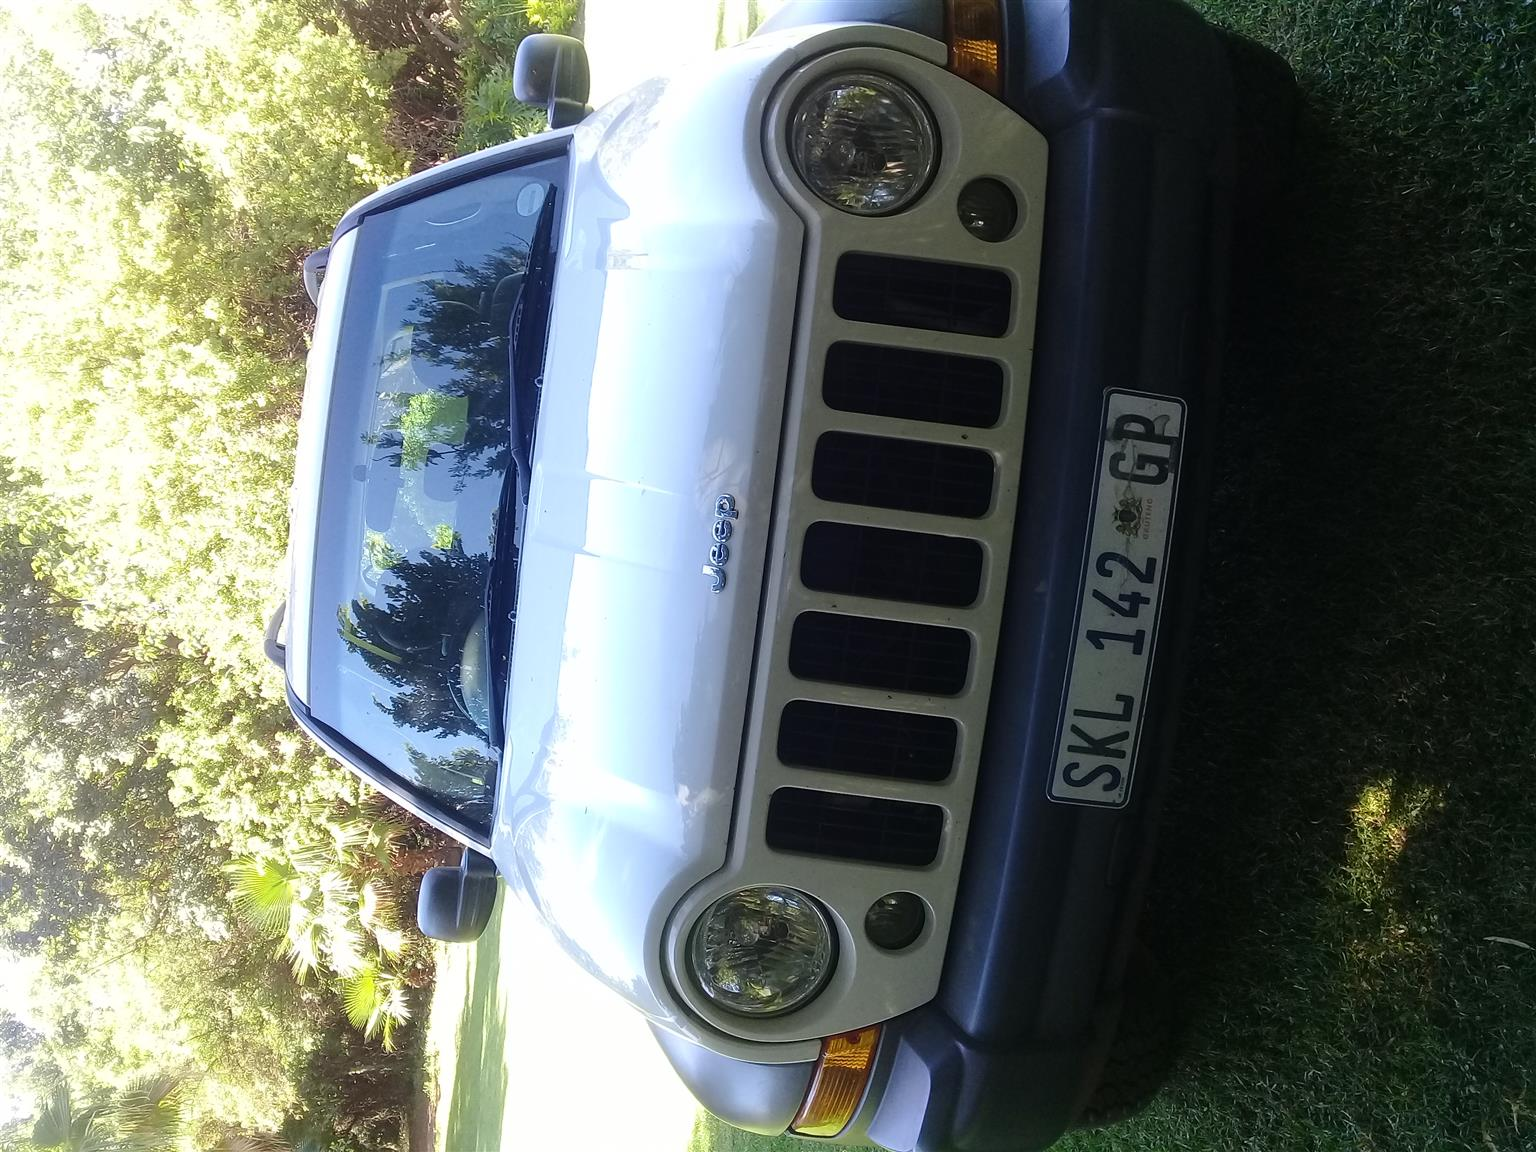 2005 Jeep Cherokee 2.4L Longitude